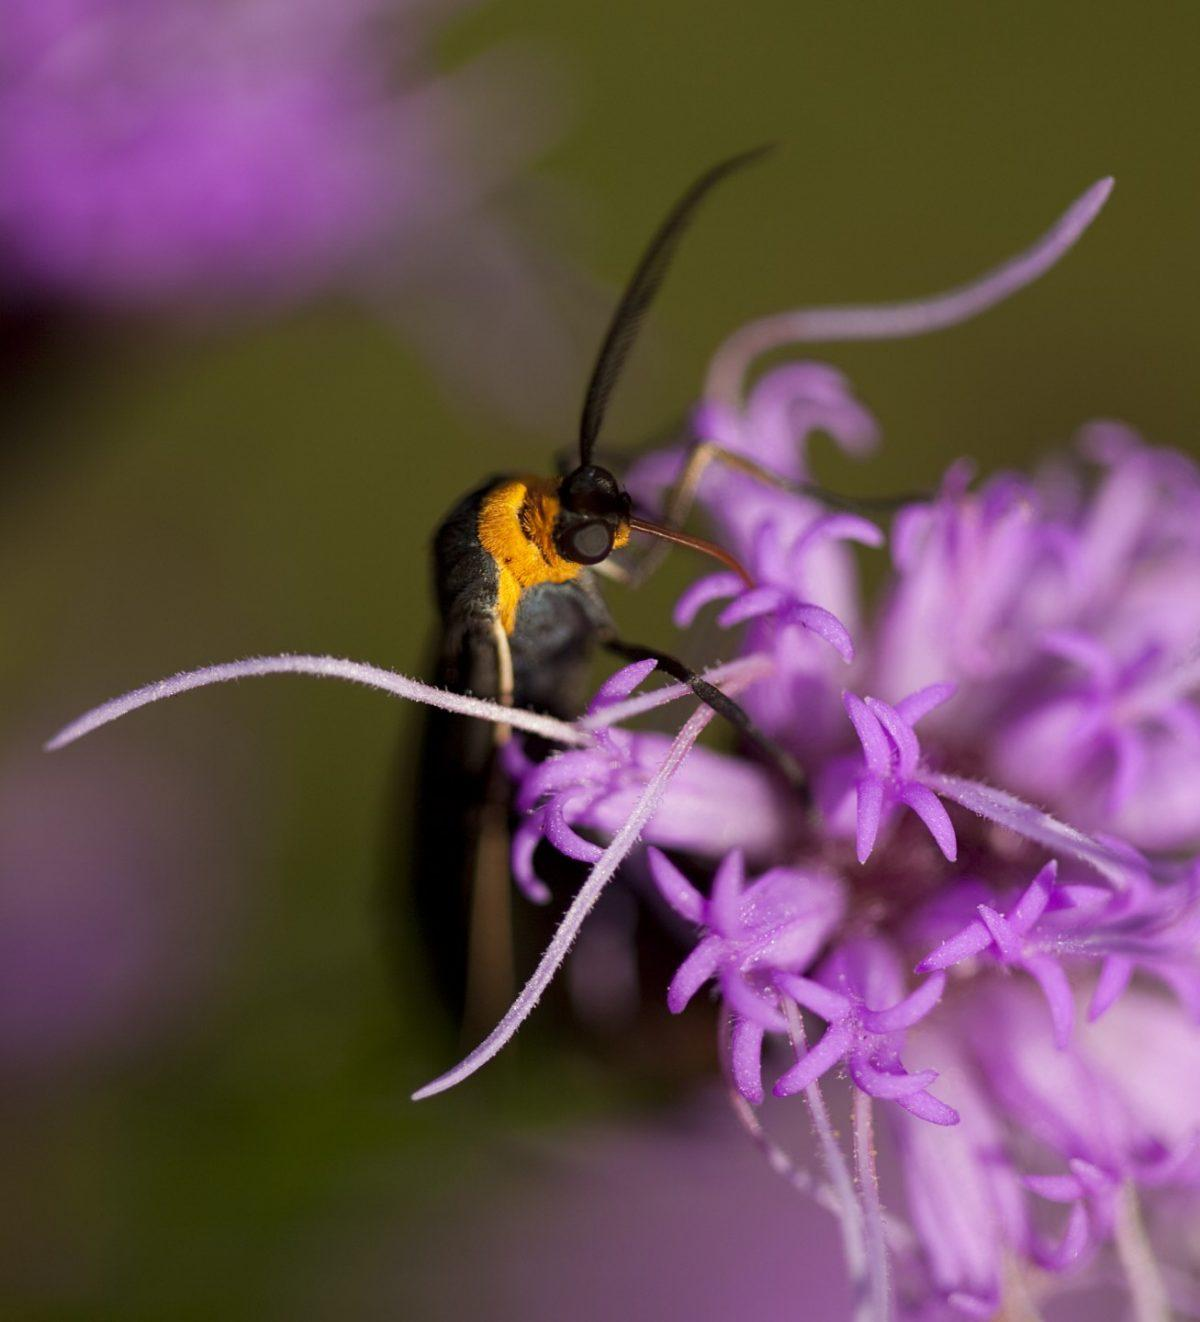 Yellow-collared Scape Moth, Cisseps fulvicollis. Photo: Linda Read